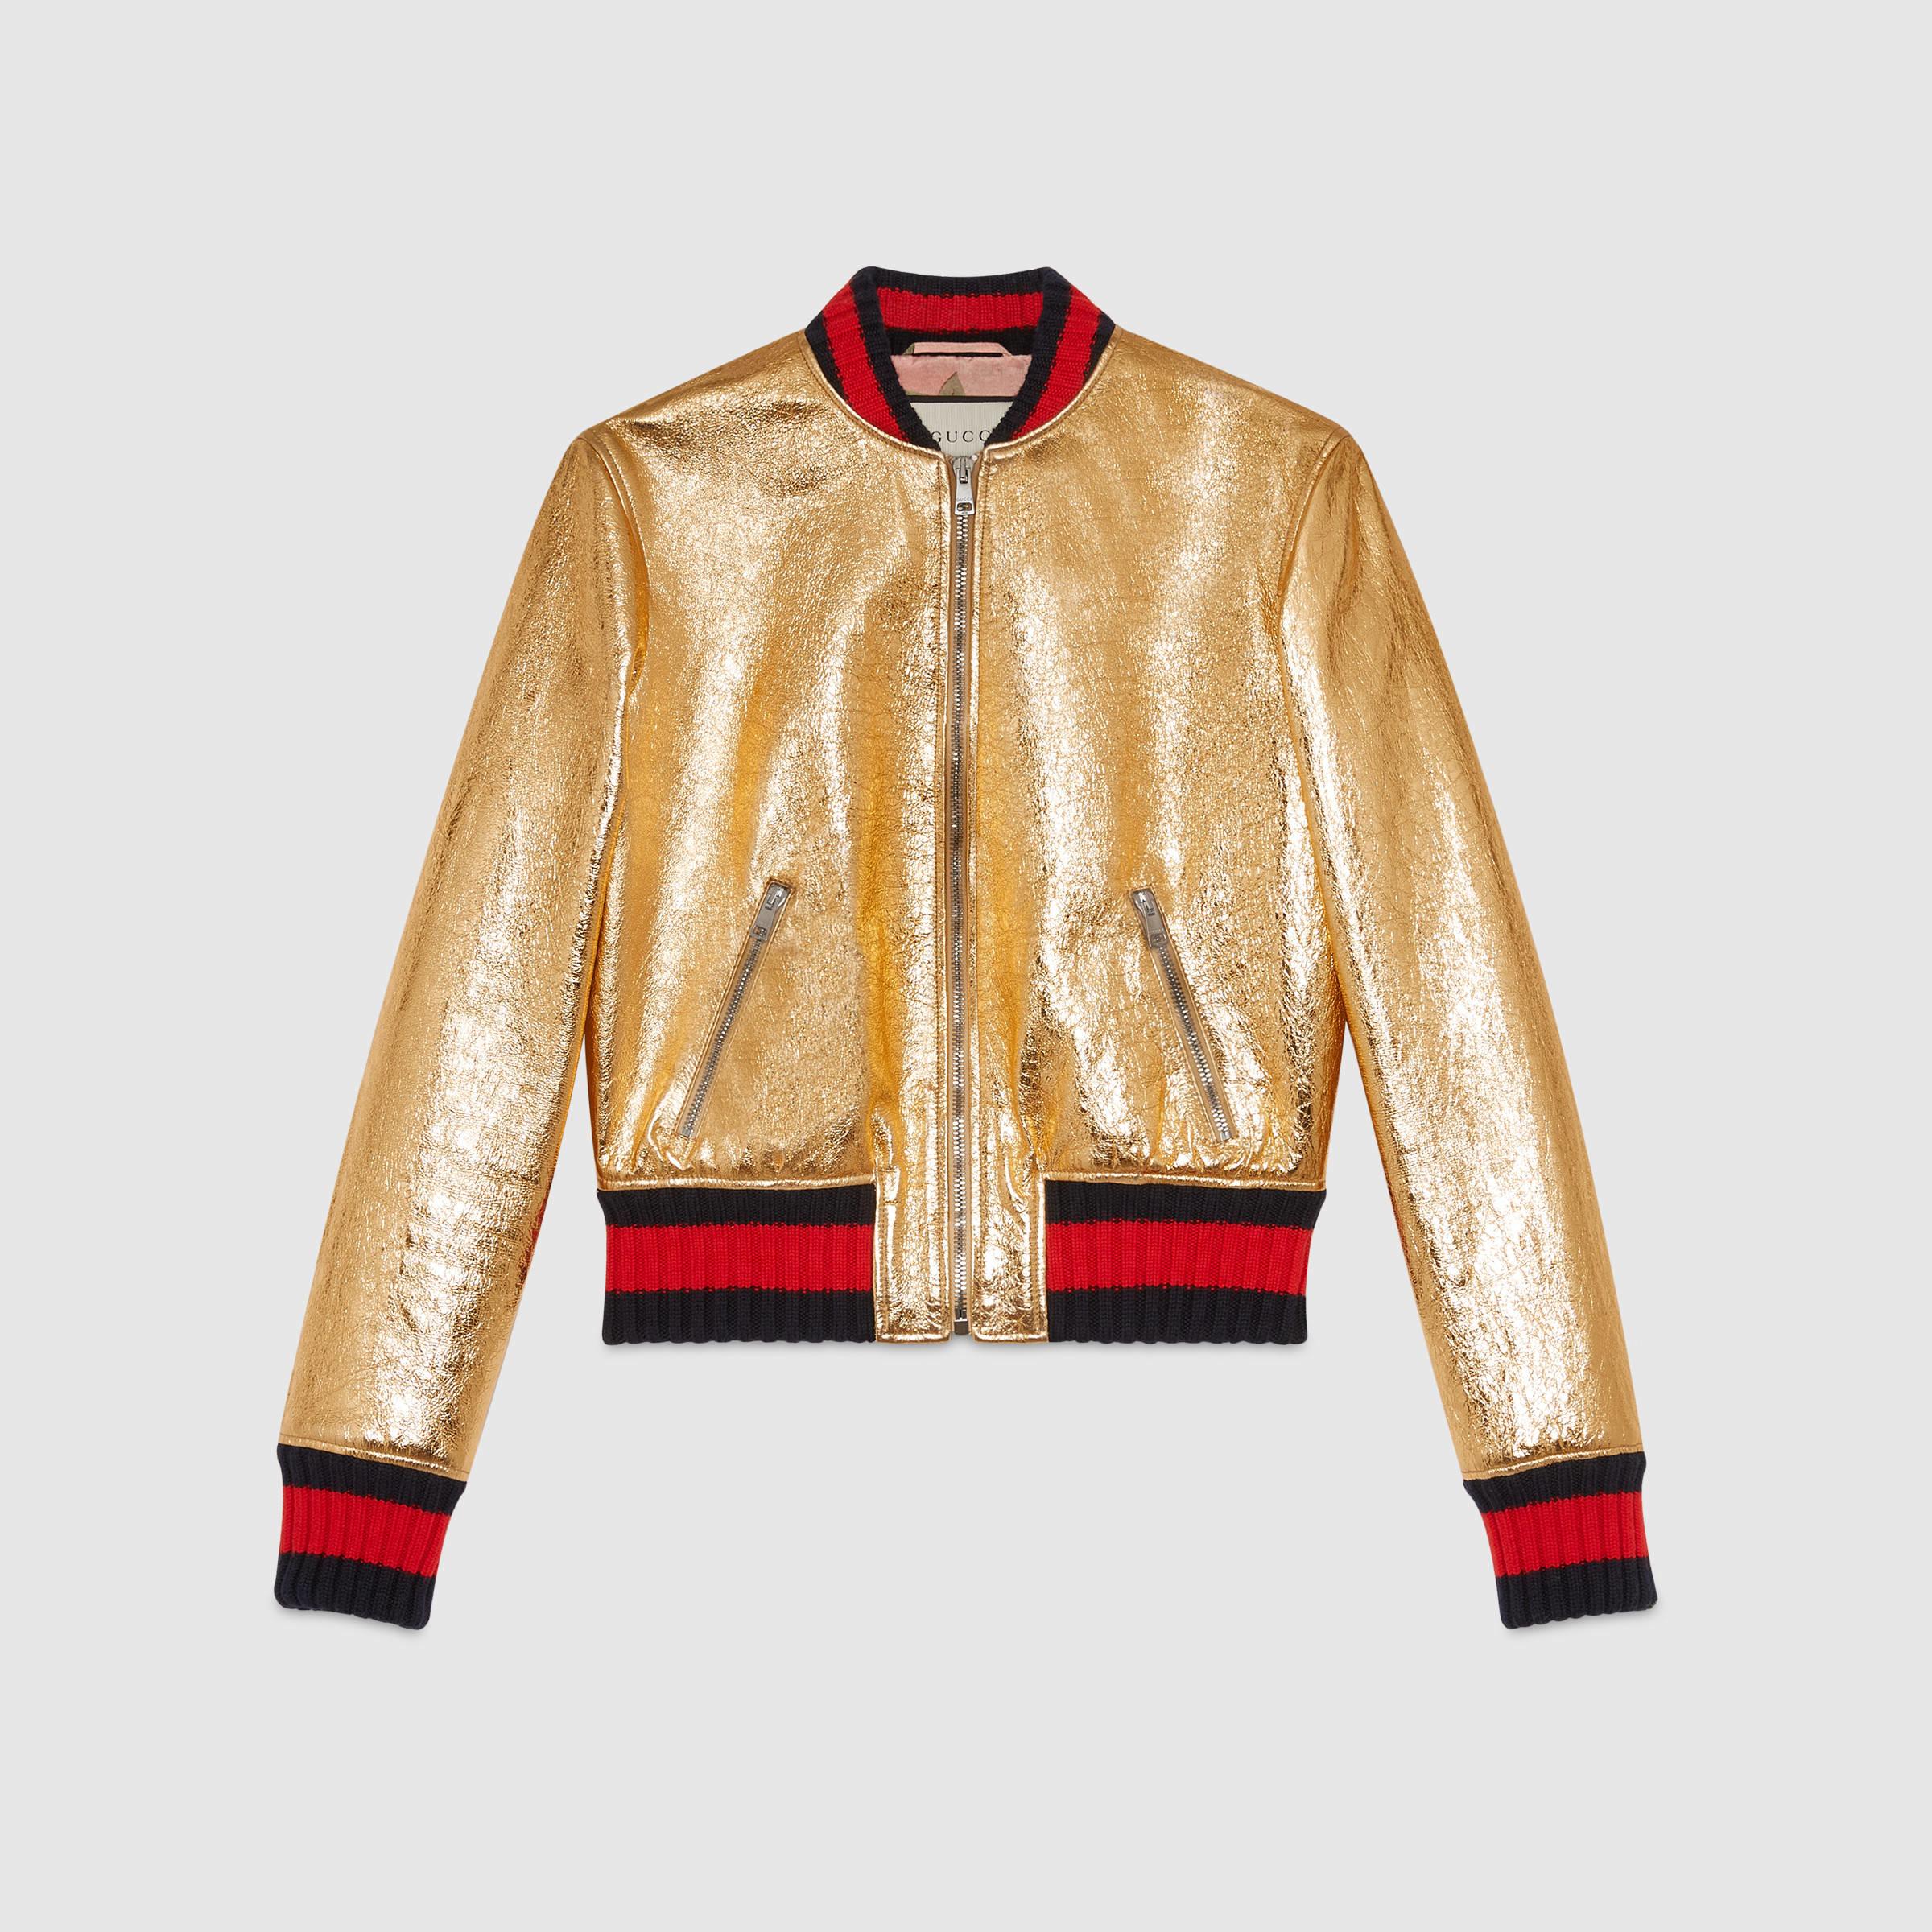 357a892e6 Gucci Metallic Leather Bomber Jacket